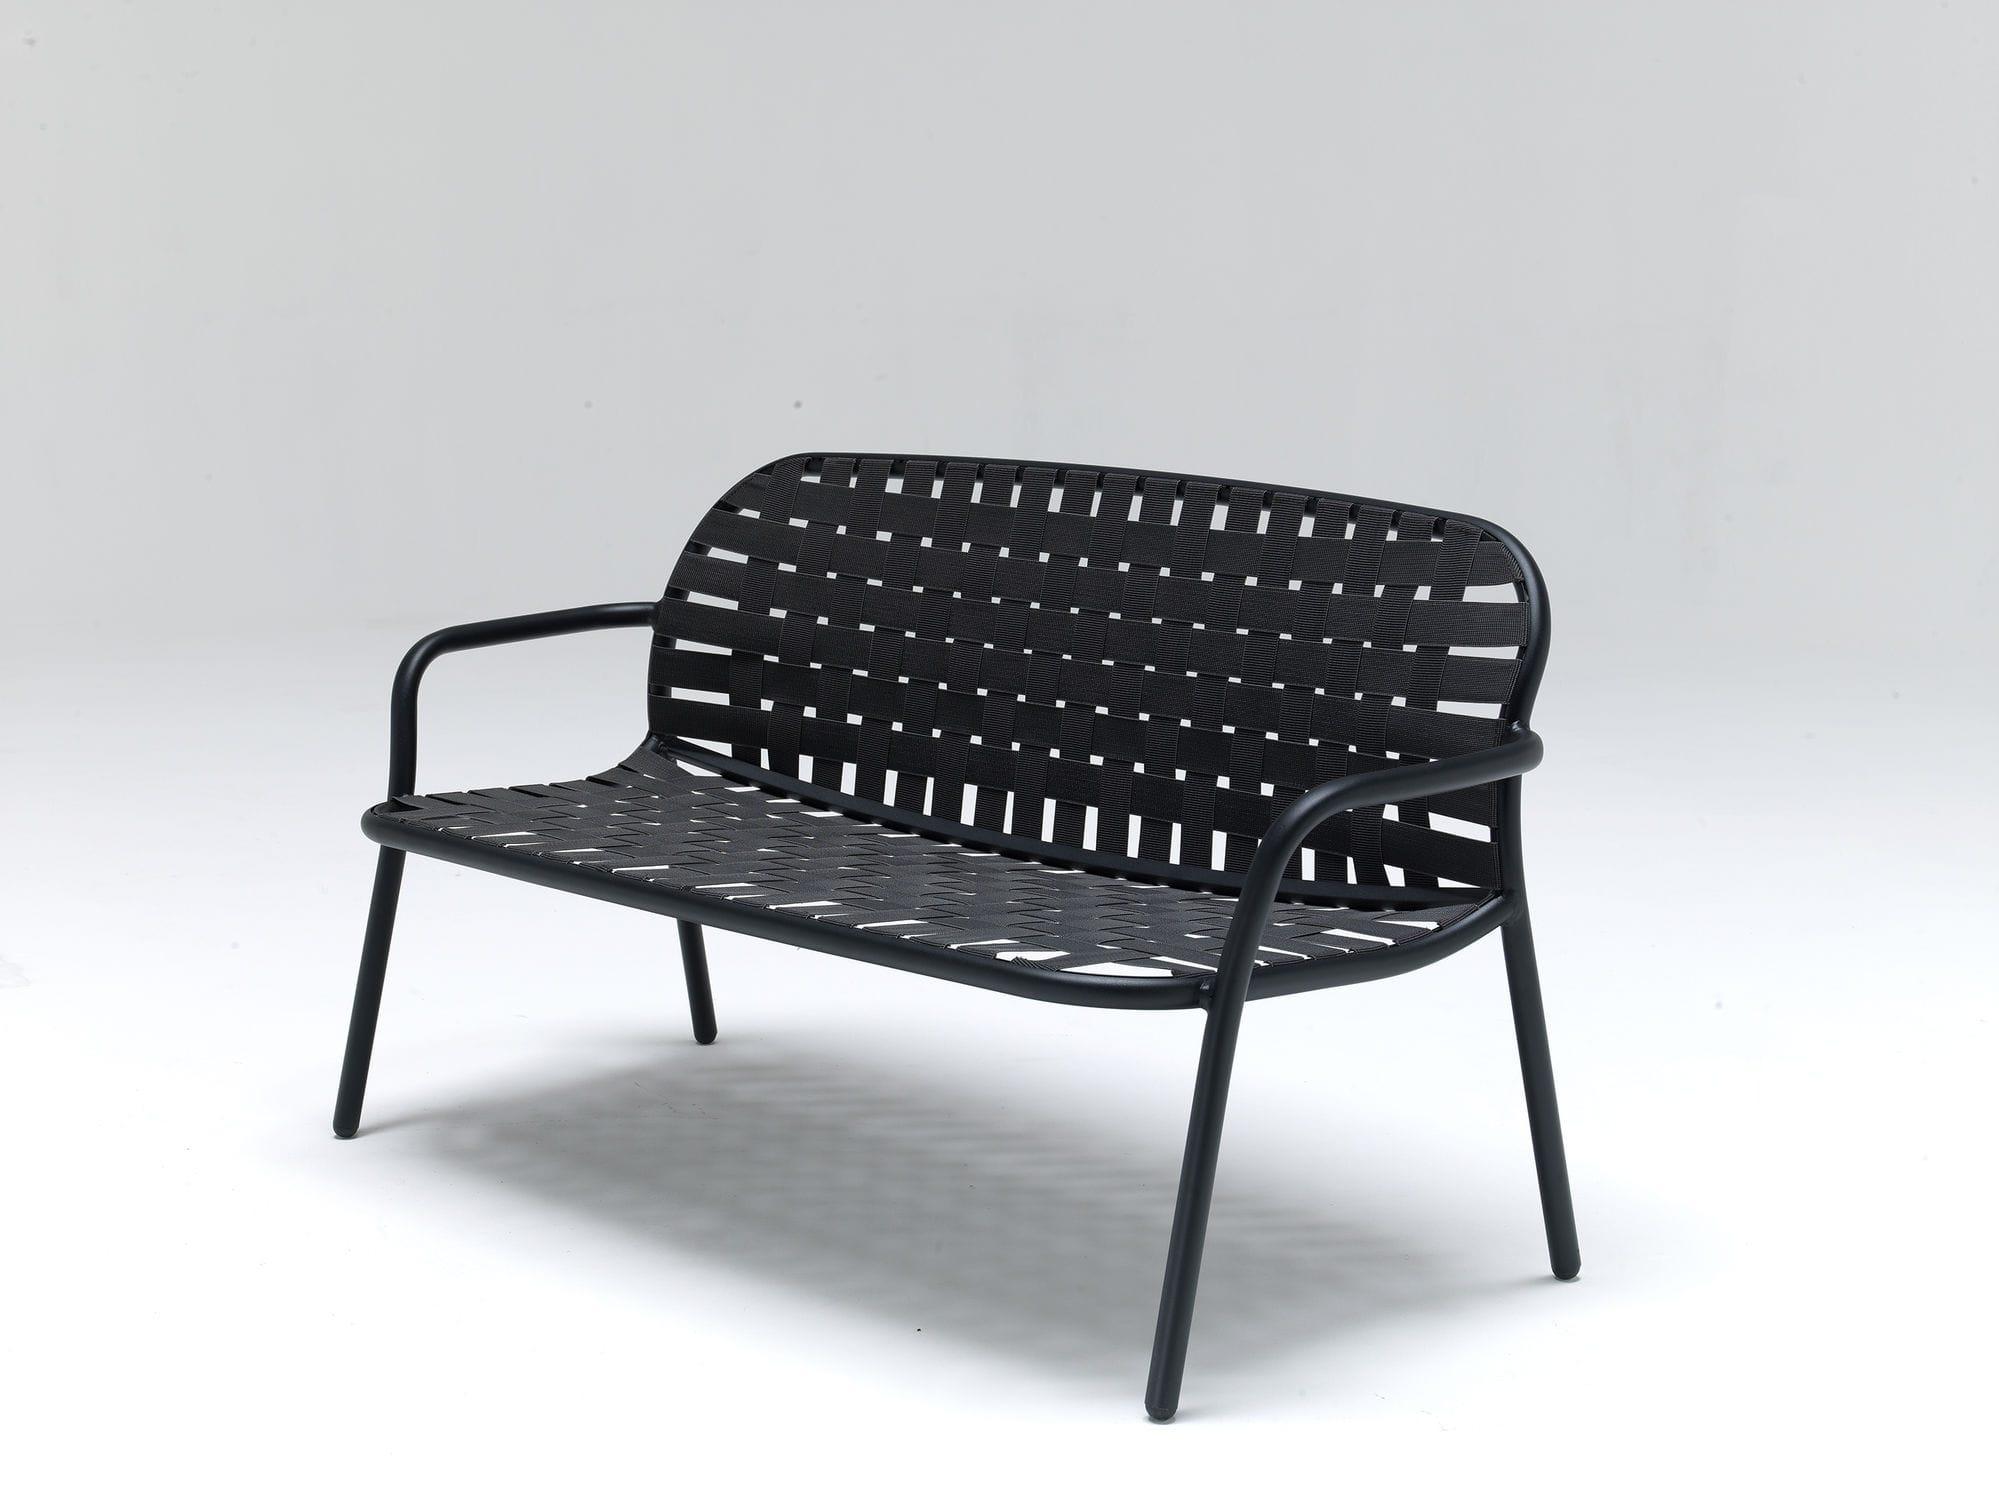 ... Garden Bench / Contemporary / Aluminum / With Backrest YARD By Stefan  Diez EMU